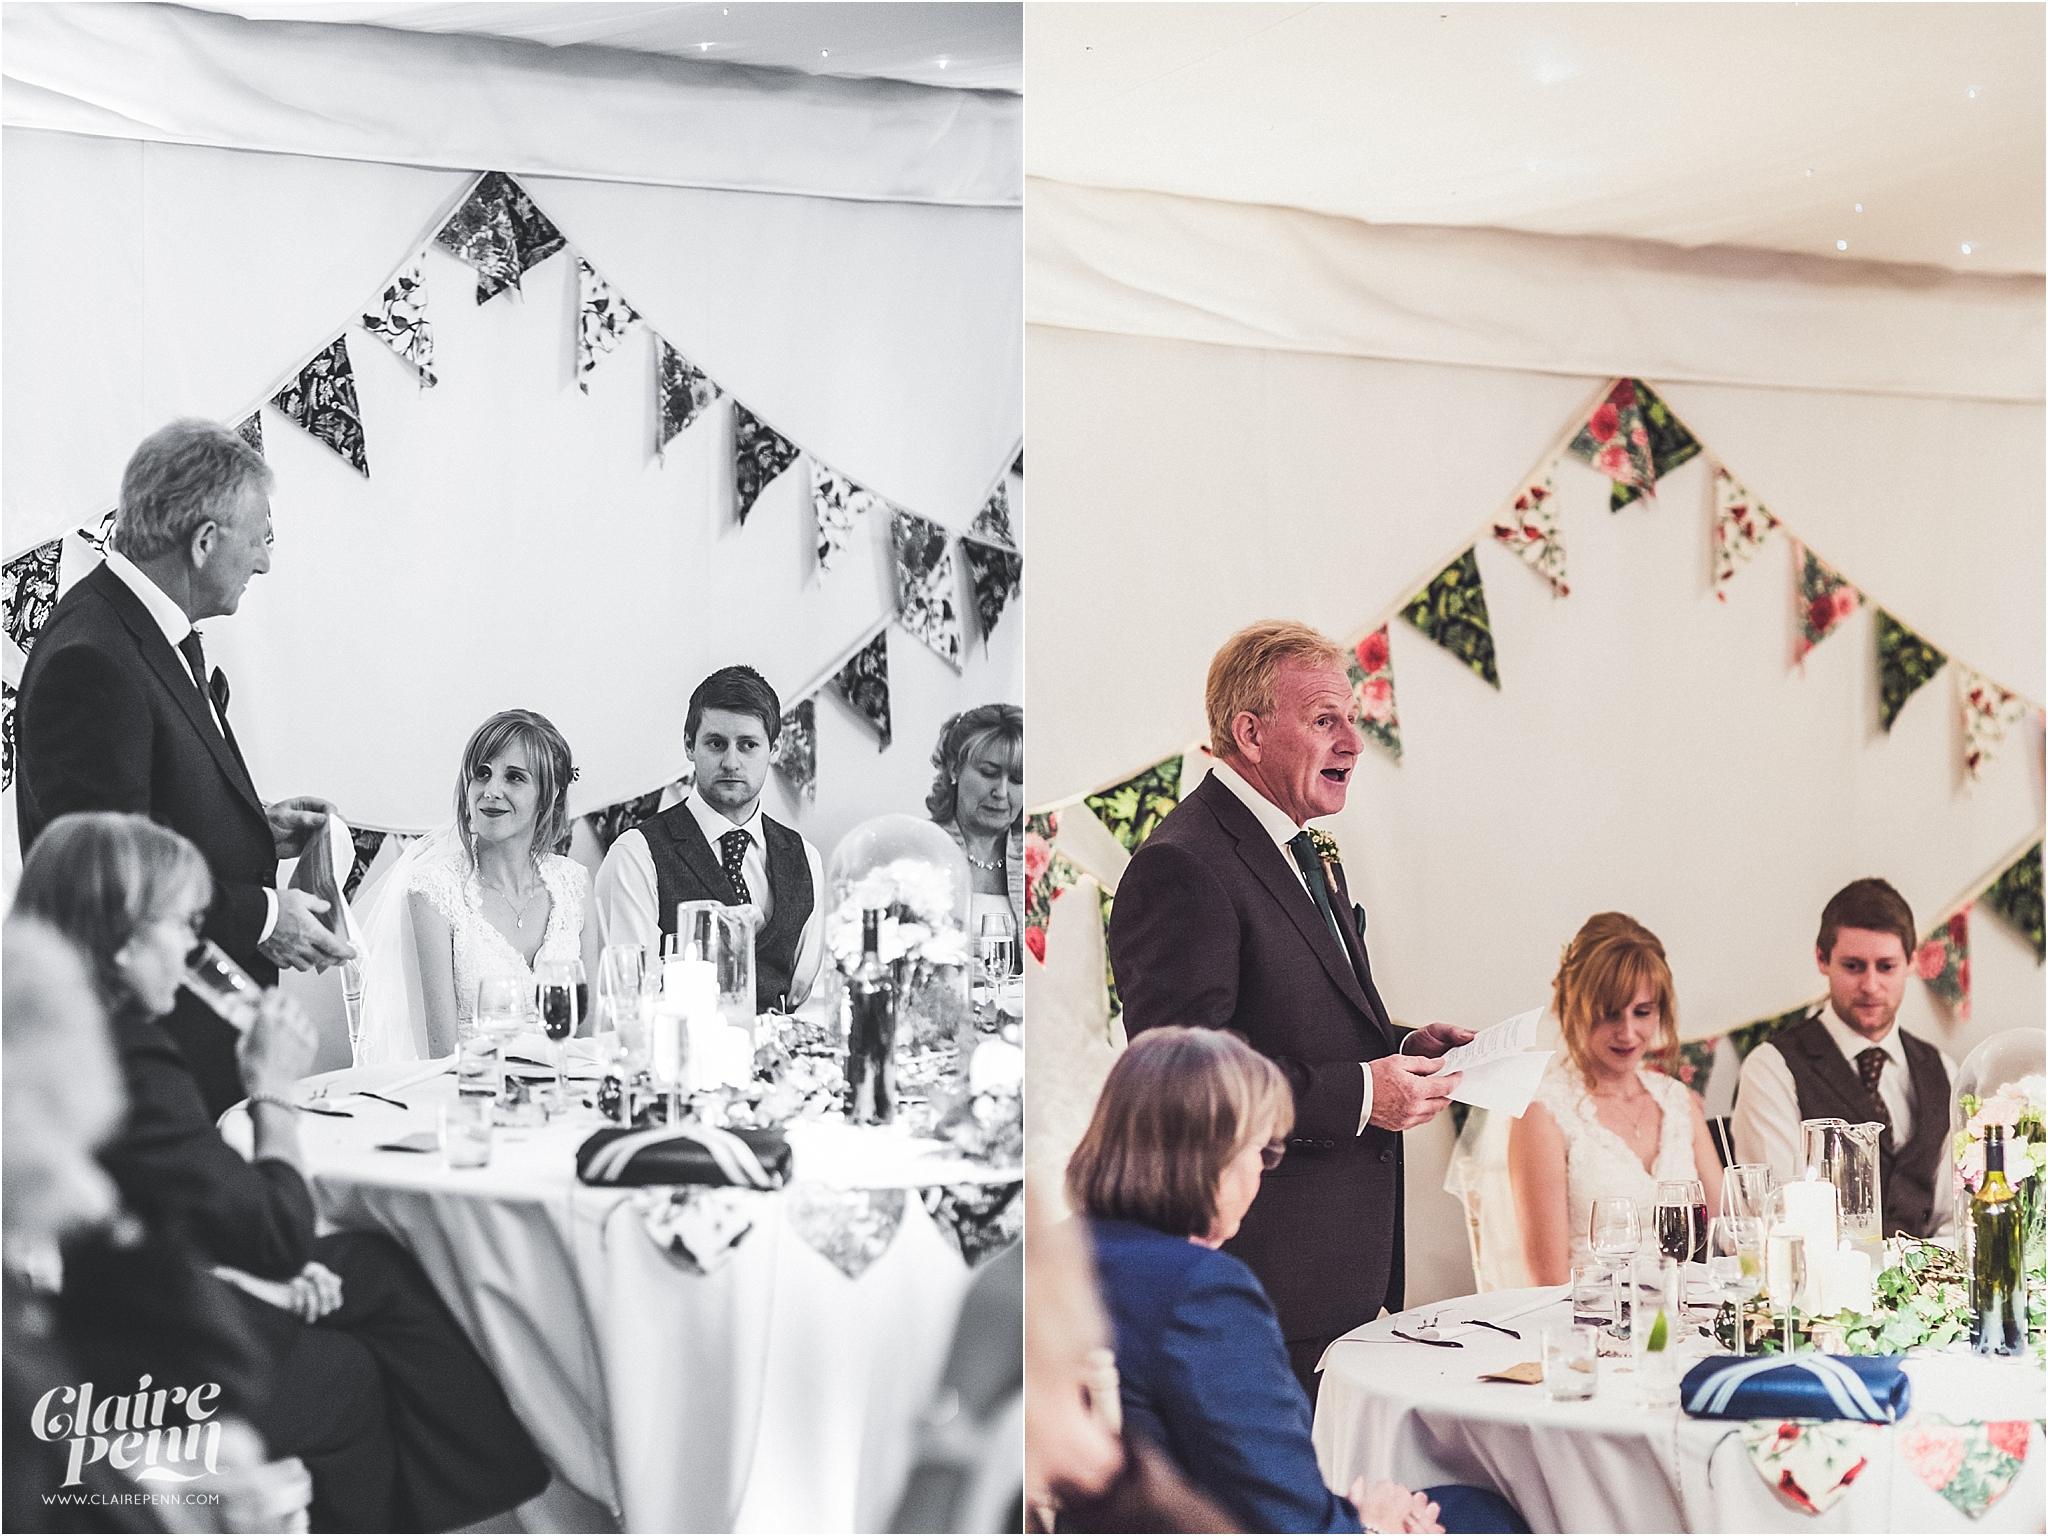 Iscoyd Park wedding, Whitchurch, Cheshire wedding photographer_0056.jpg